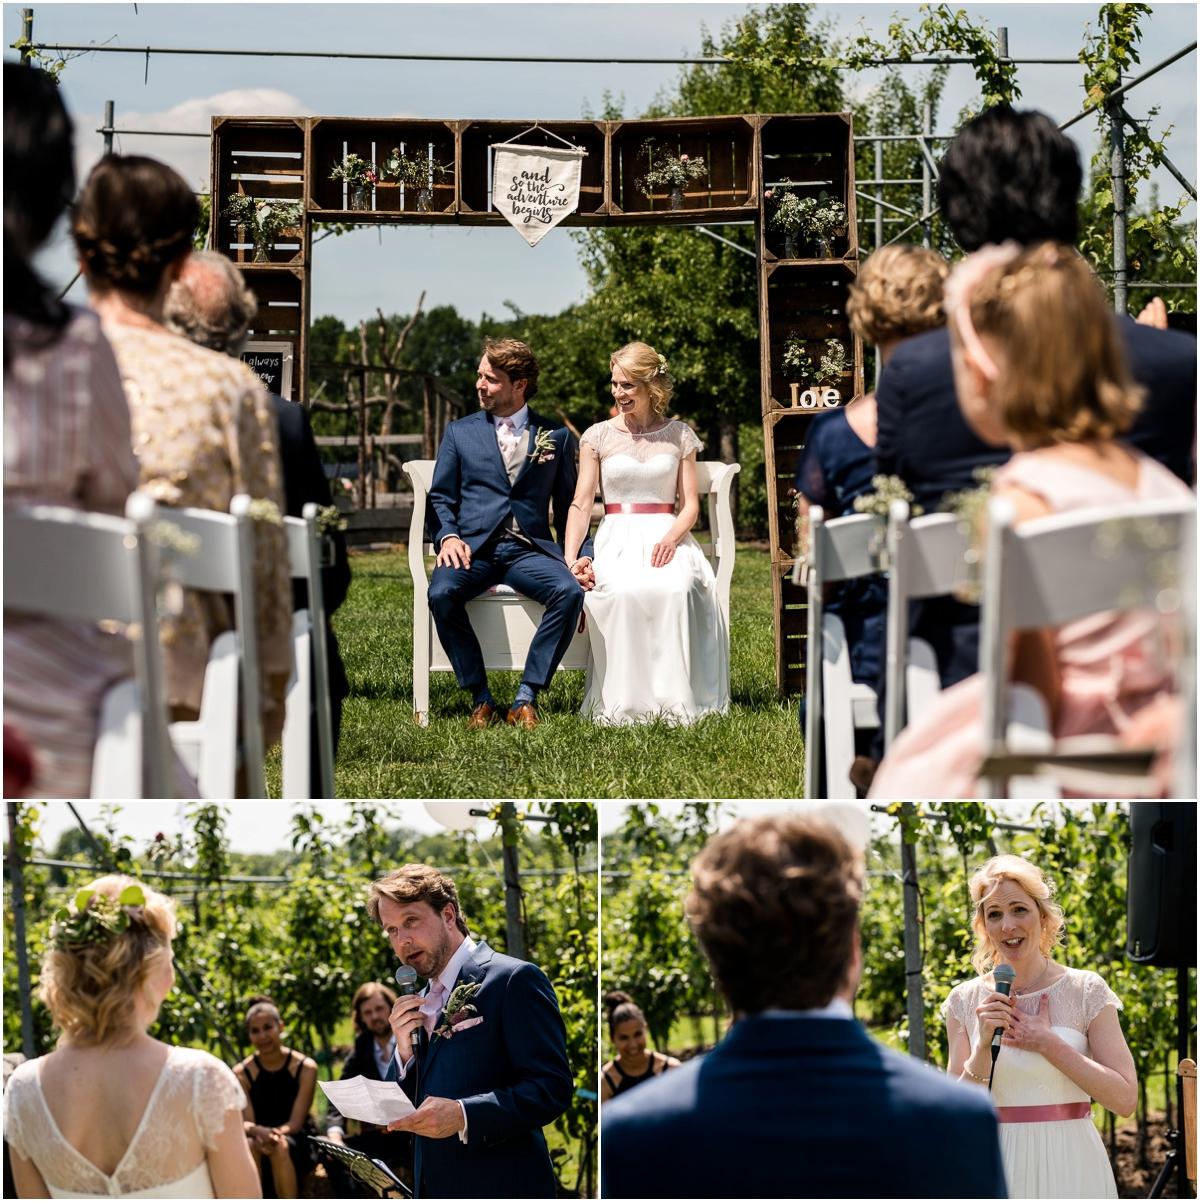 Dayofmylife-trouwen-fruittuinverbeek-bruidsfotograaf-wedding-germany-dutch9